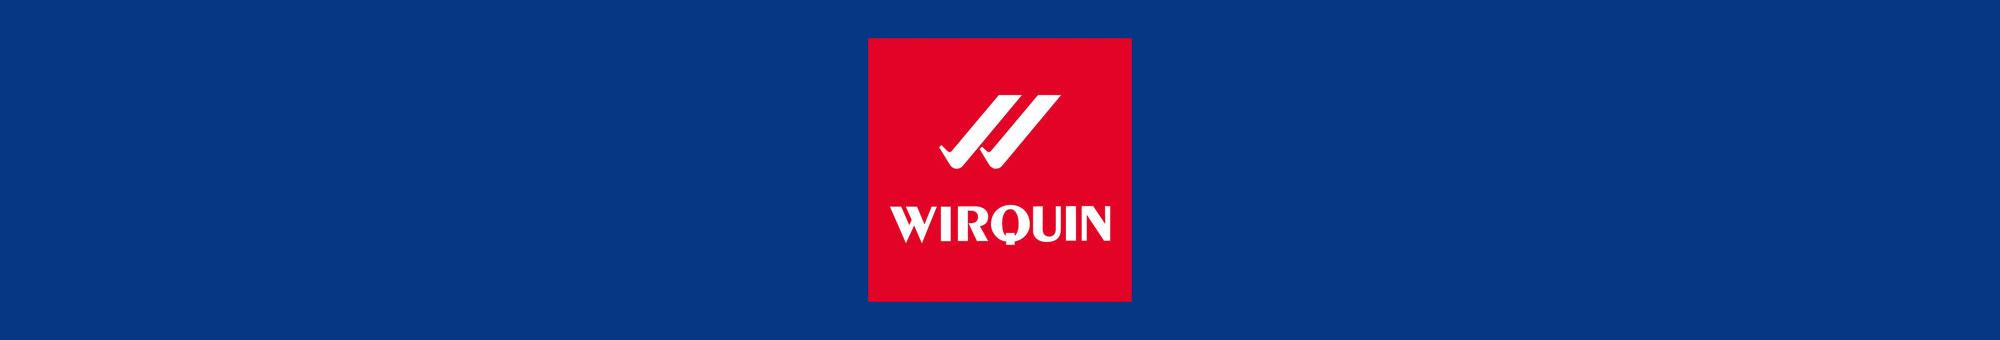 Logo de Wirquin